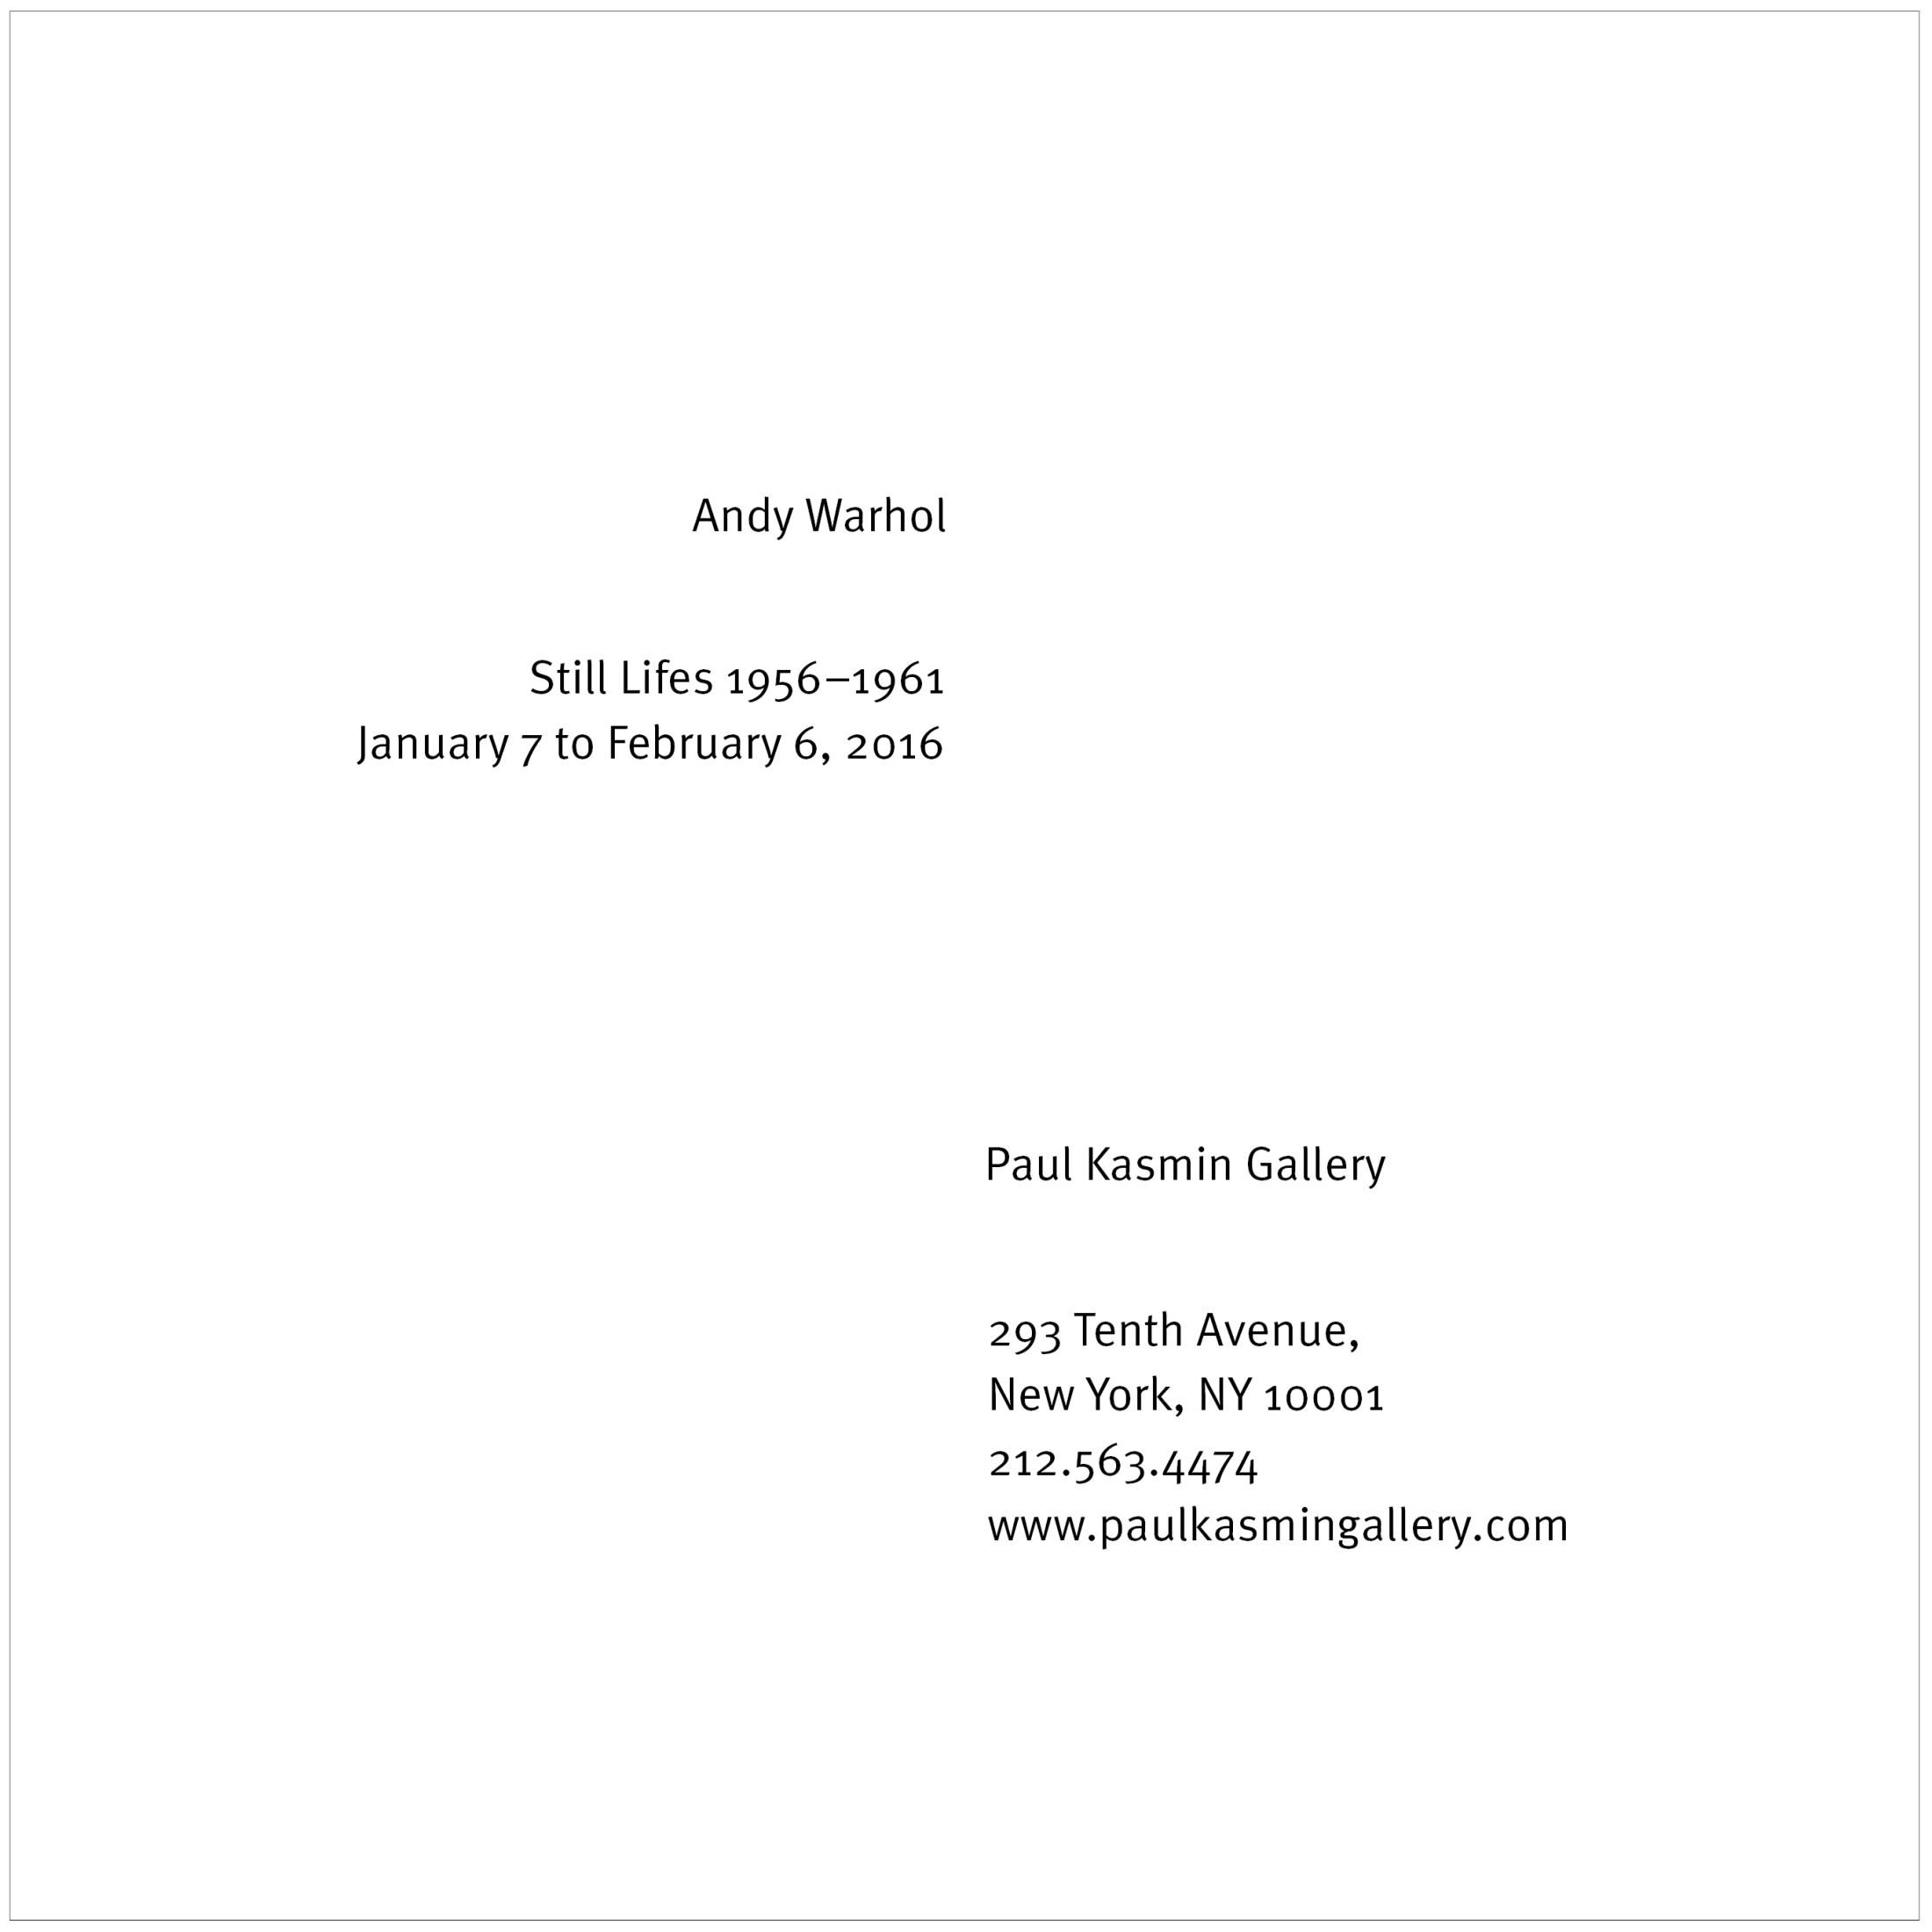 VisComm Warhol Poster 2015